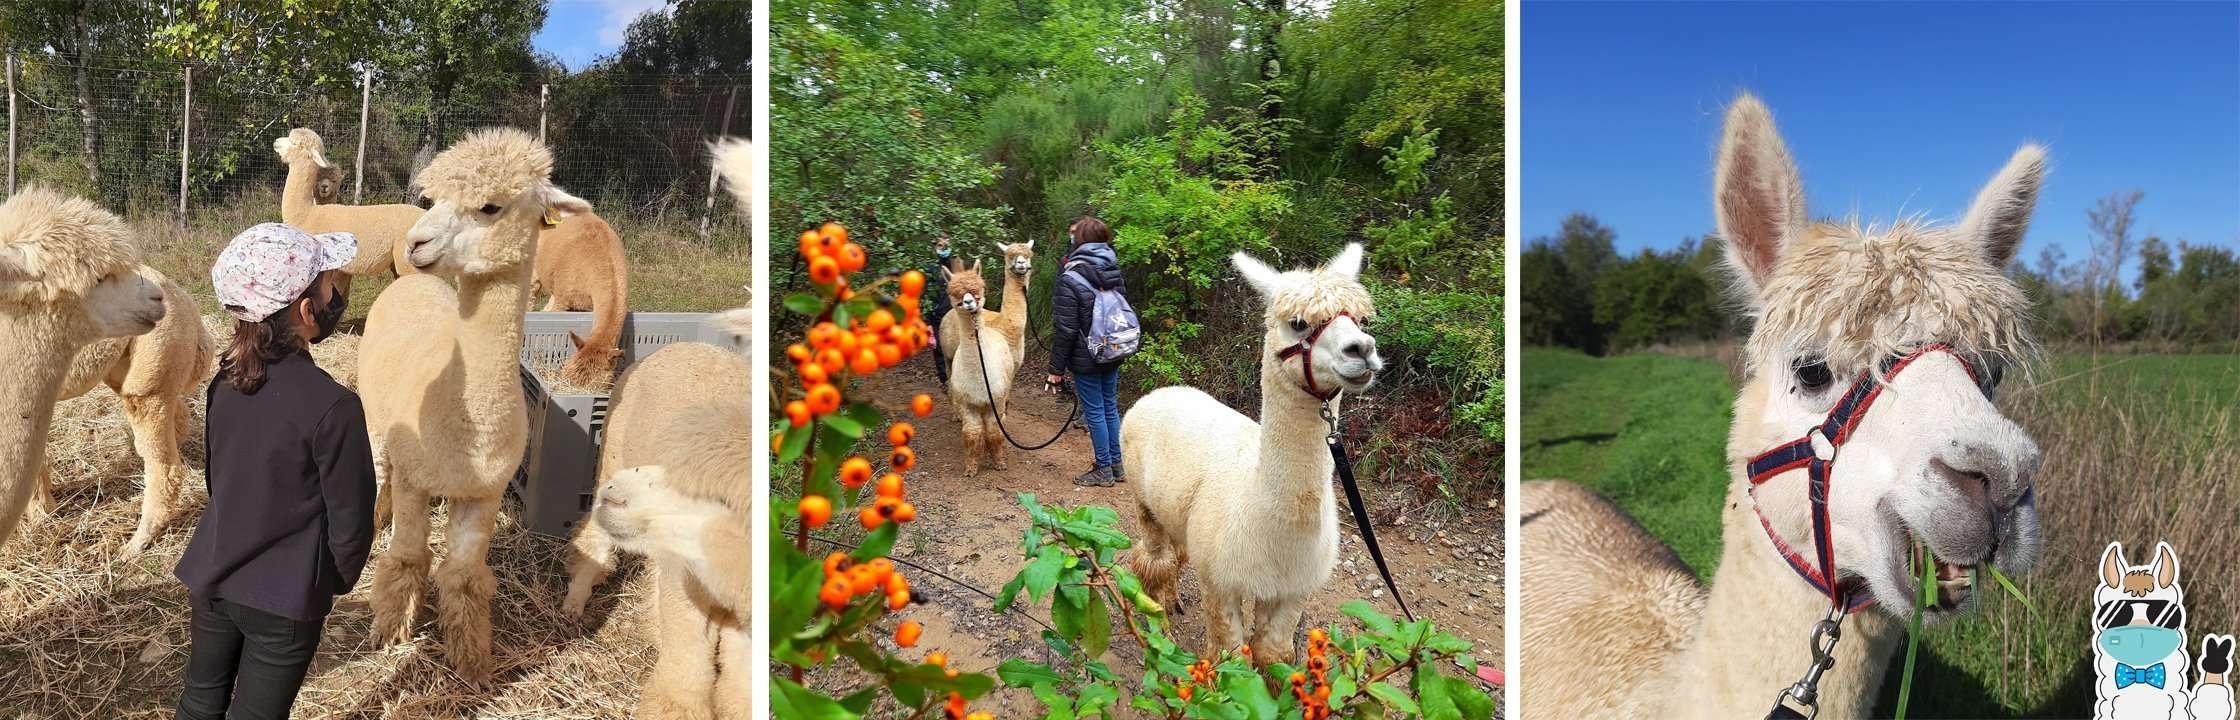 trekking e visite con alpaca